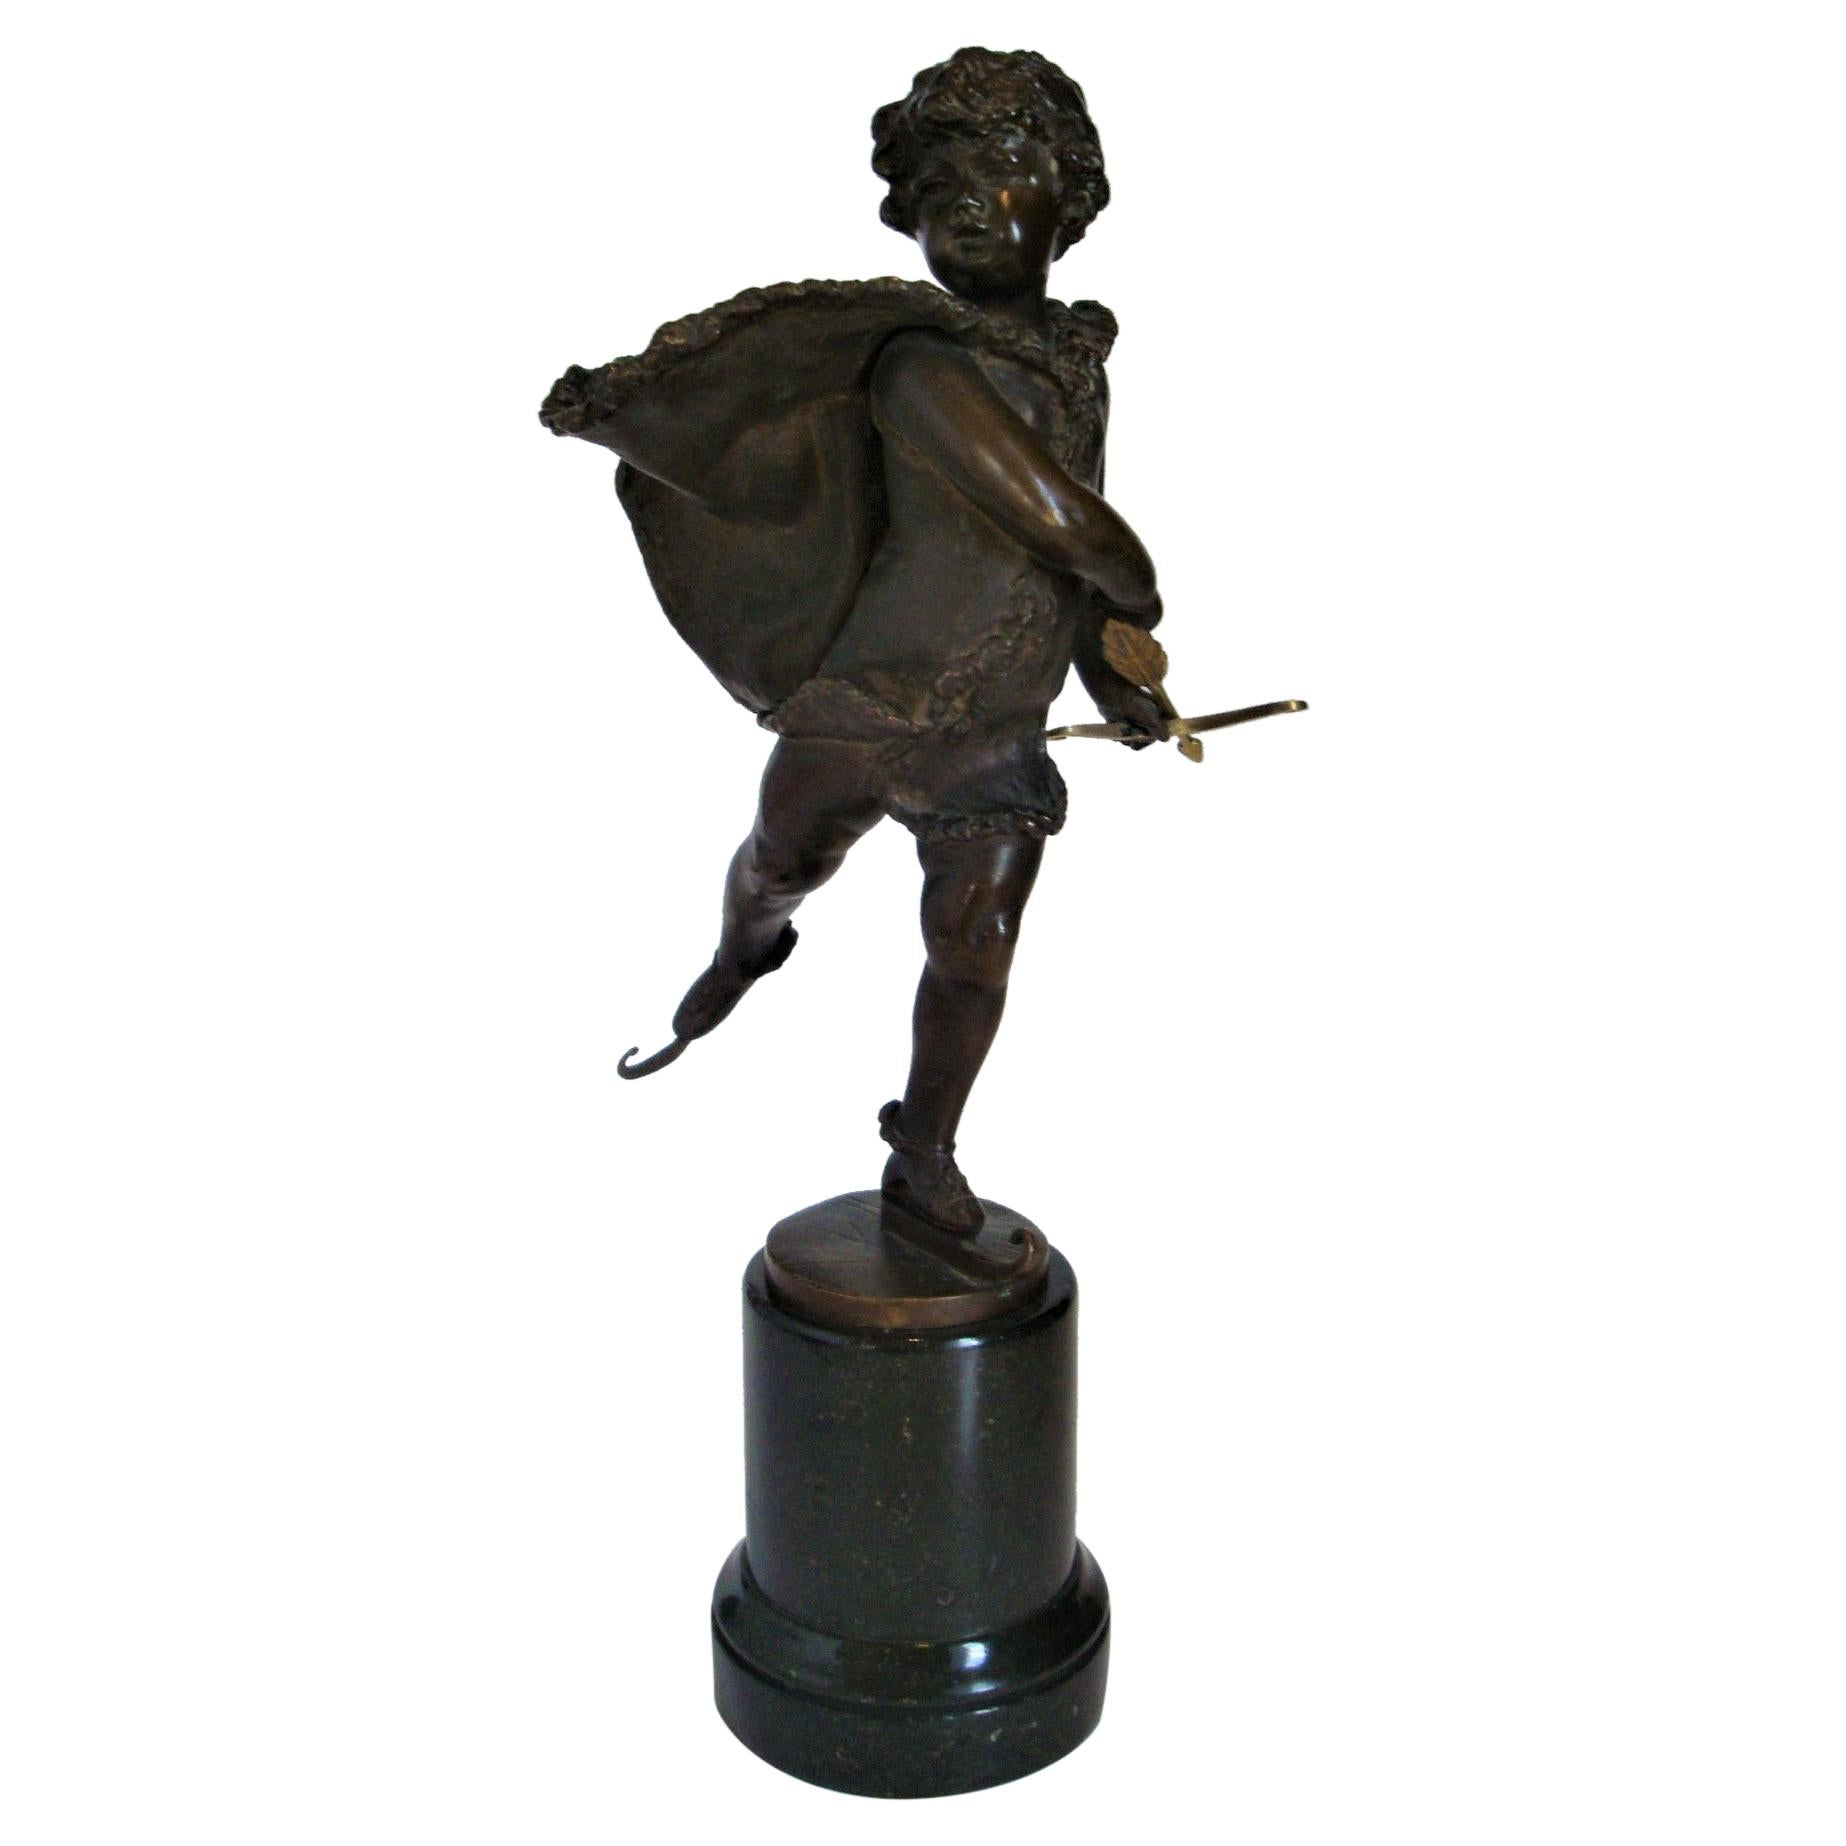 Franz Iffland Bronze Sculpture of a Cupid Boy Ice Skater, ca 1900